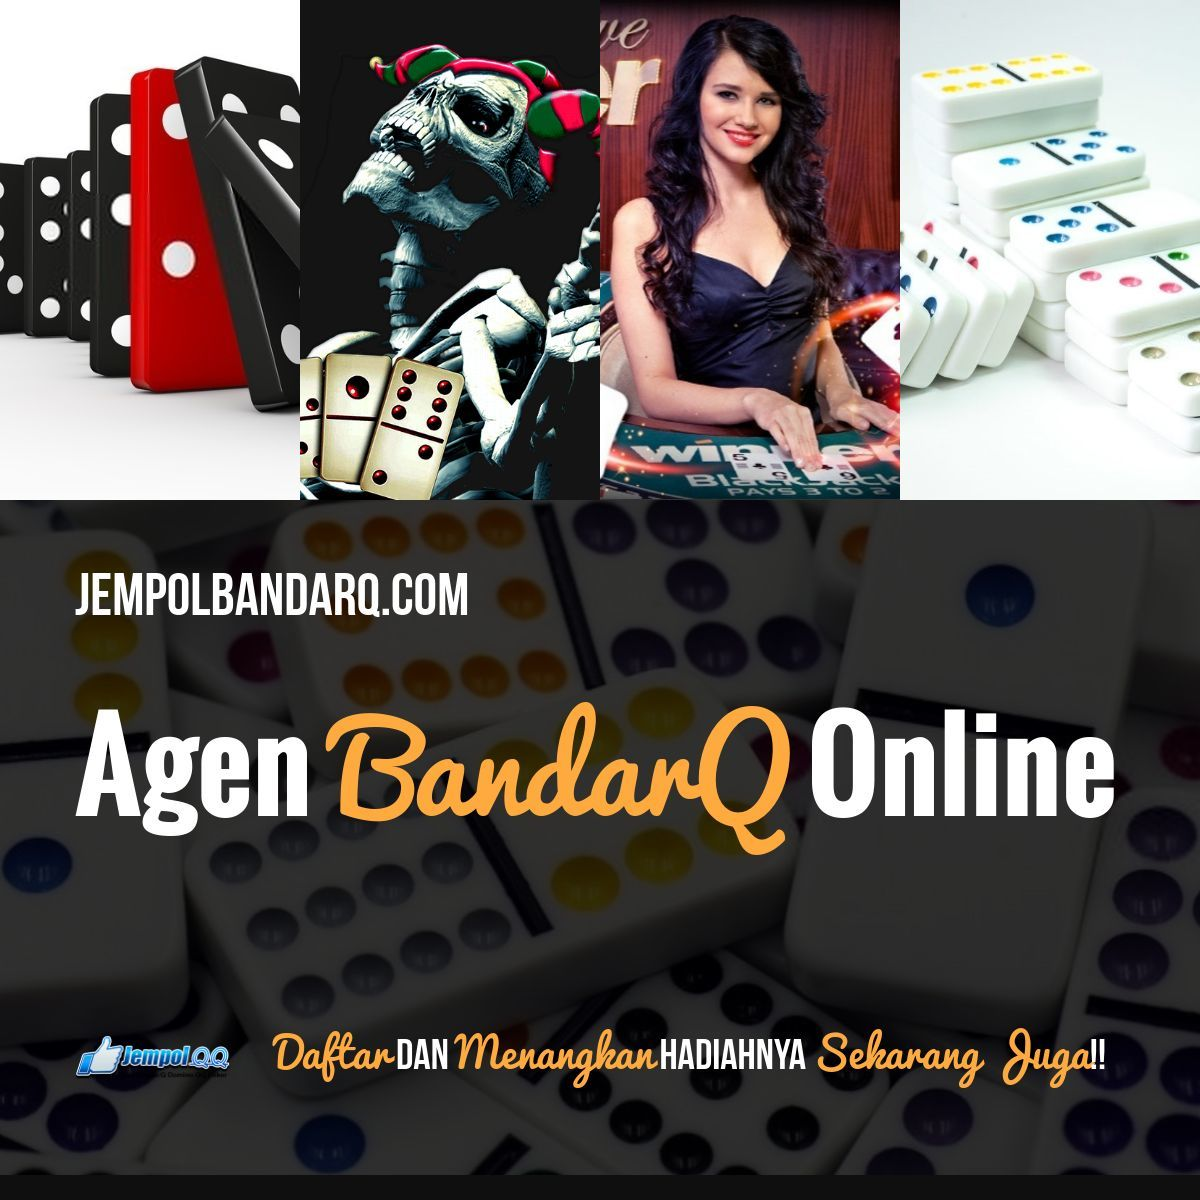 Bandarq Online Indonesia Bandarpoker Online Indonesia Domino 99 Online Domino Q Di Indonesia Yang Sepertinya Lebih Bermanfaat